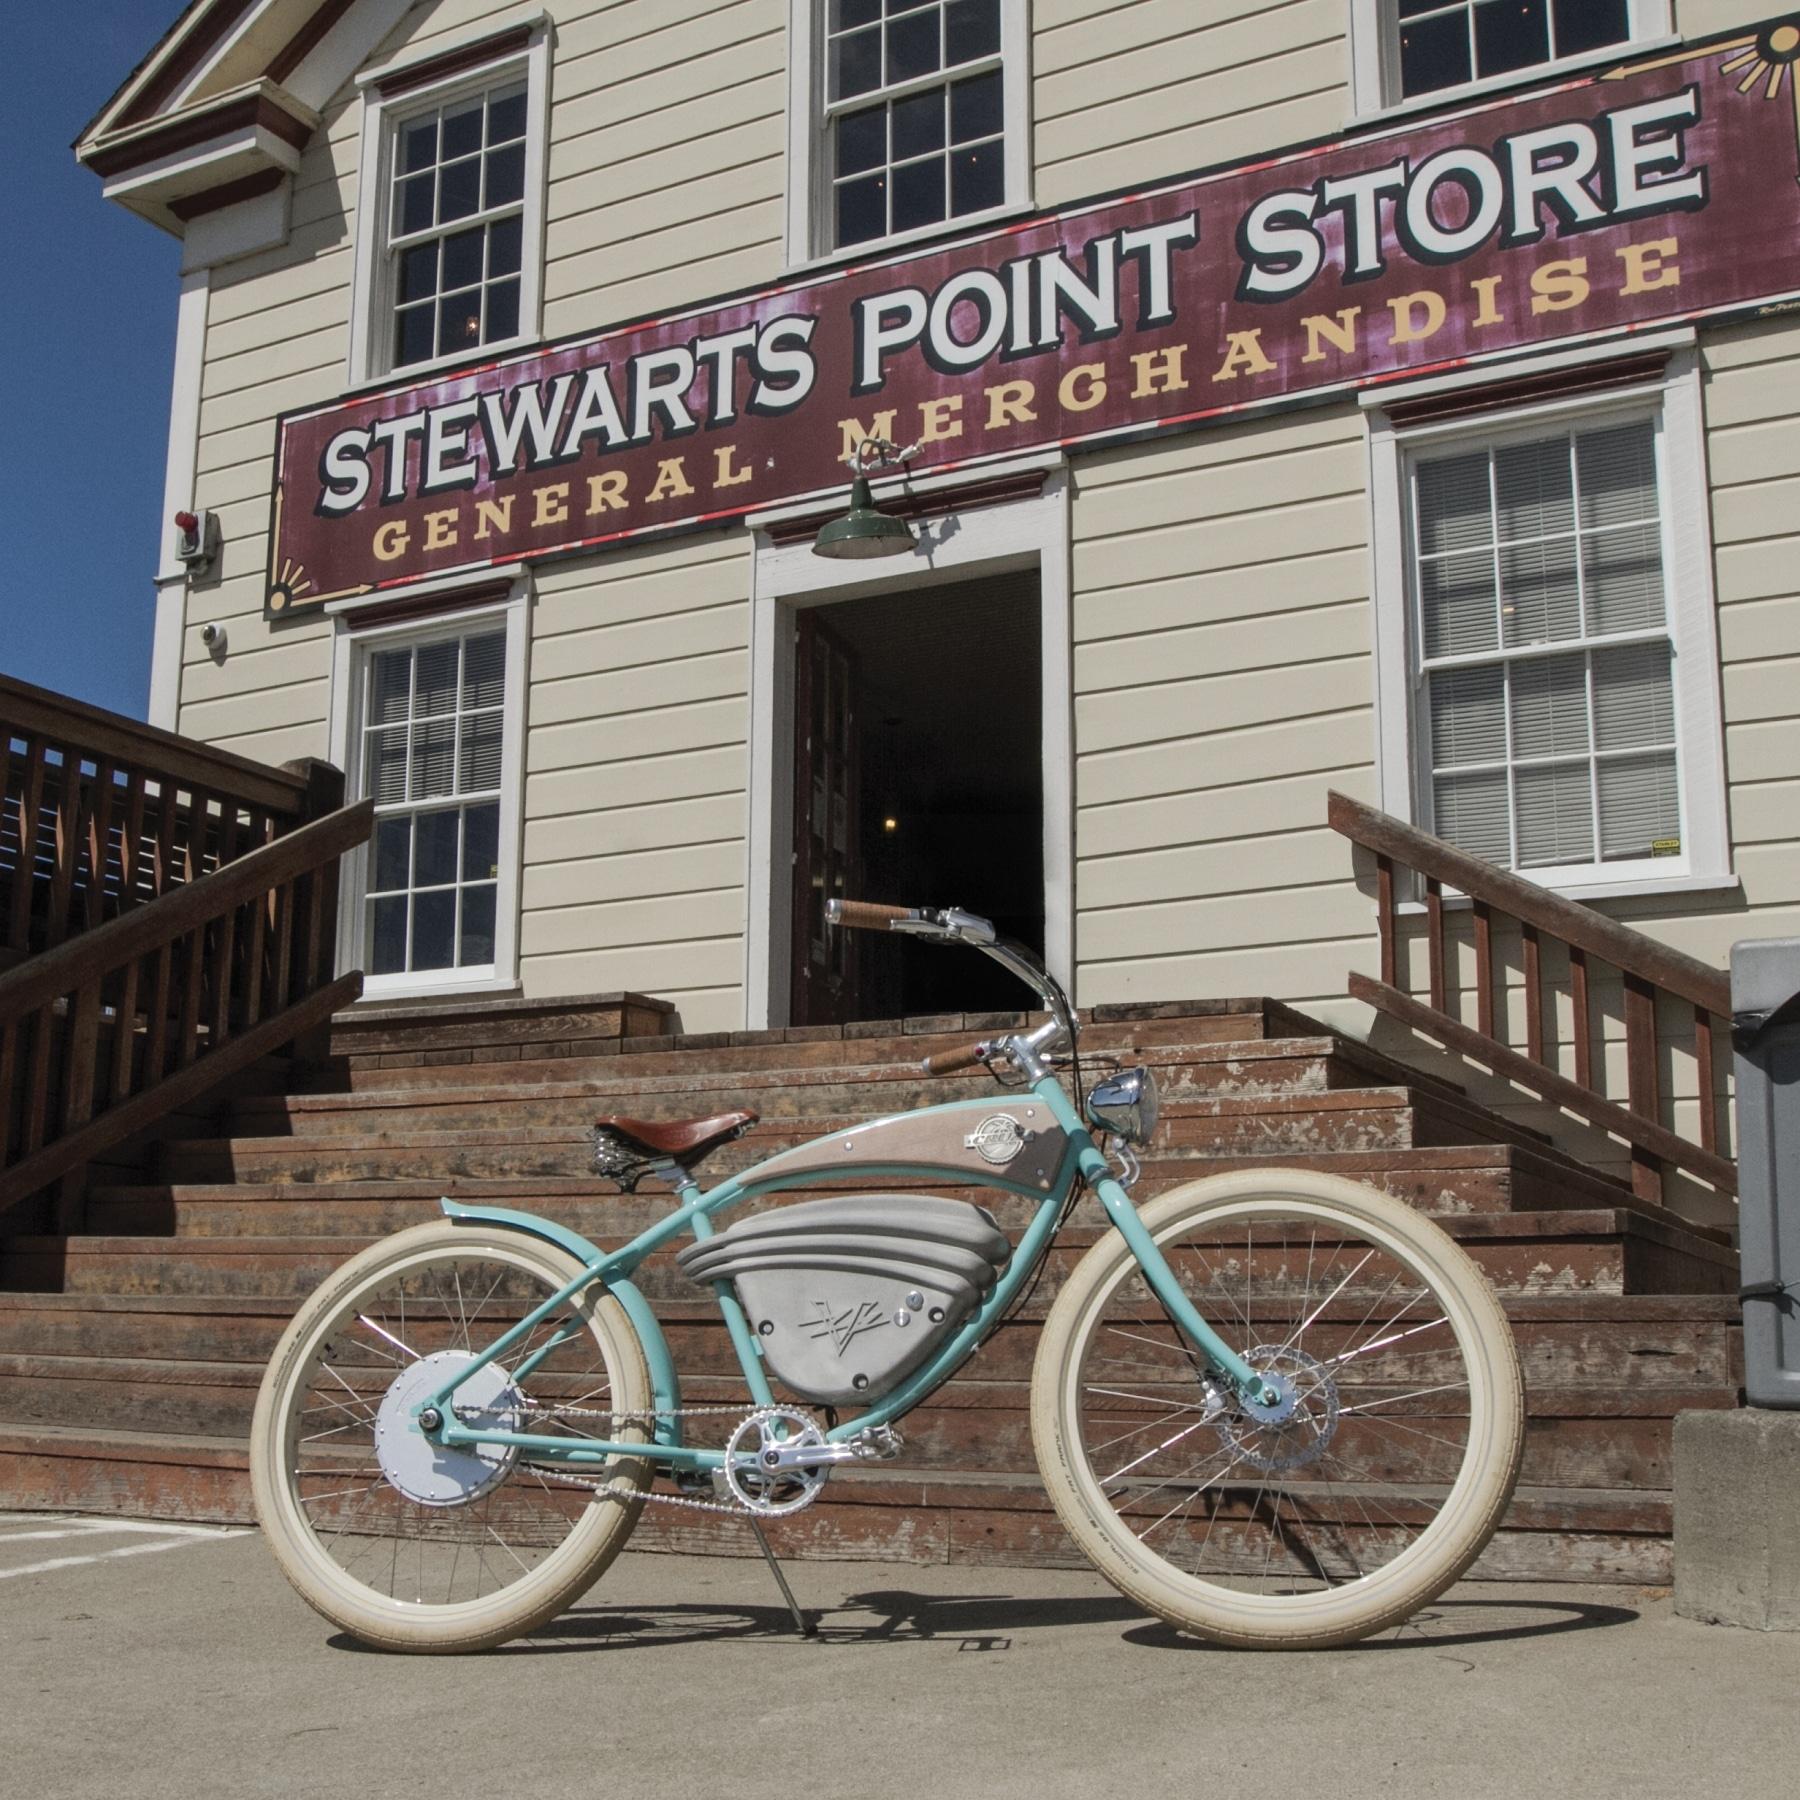 aqua cruz bikes infront of stewarts point store